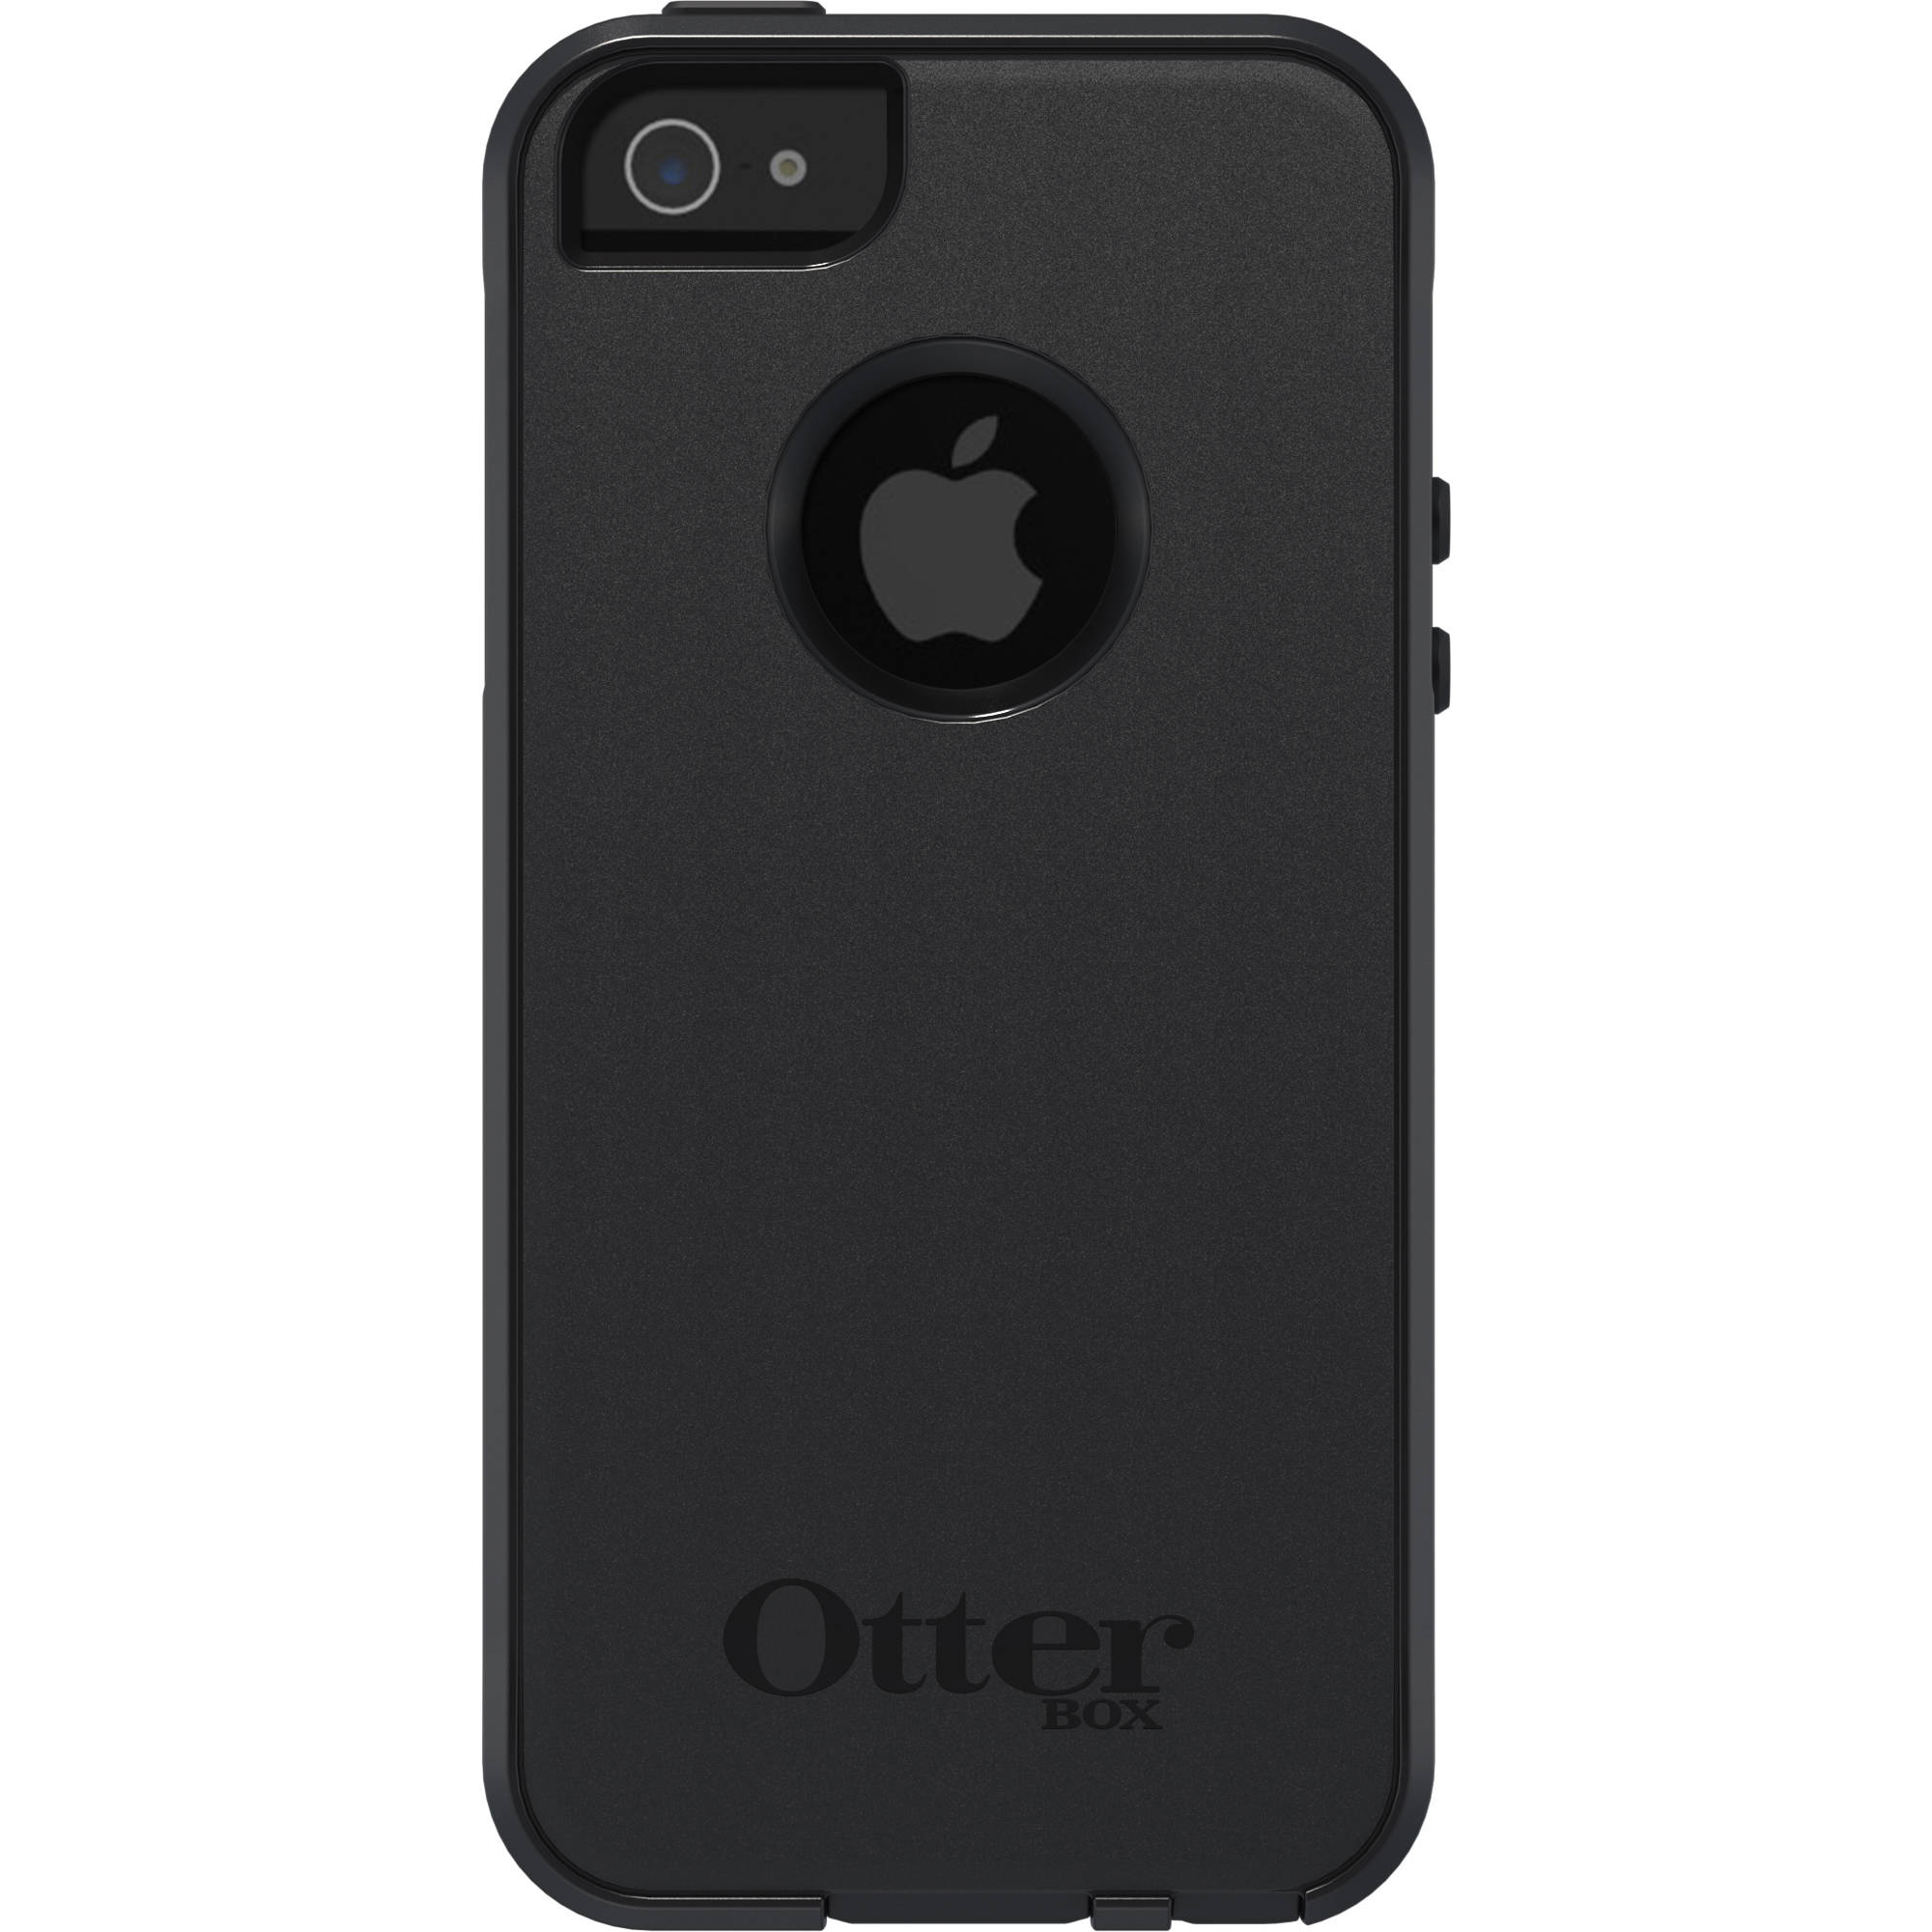 Case Design otter cell phone case : Otter Box Commuter Case for iPhone 5/5s/SE (Black) 77-21912 Bu0026H